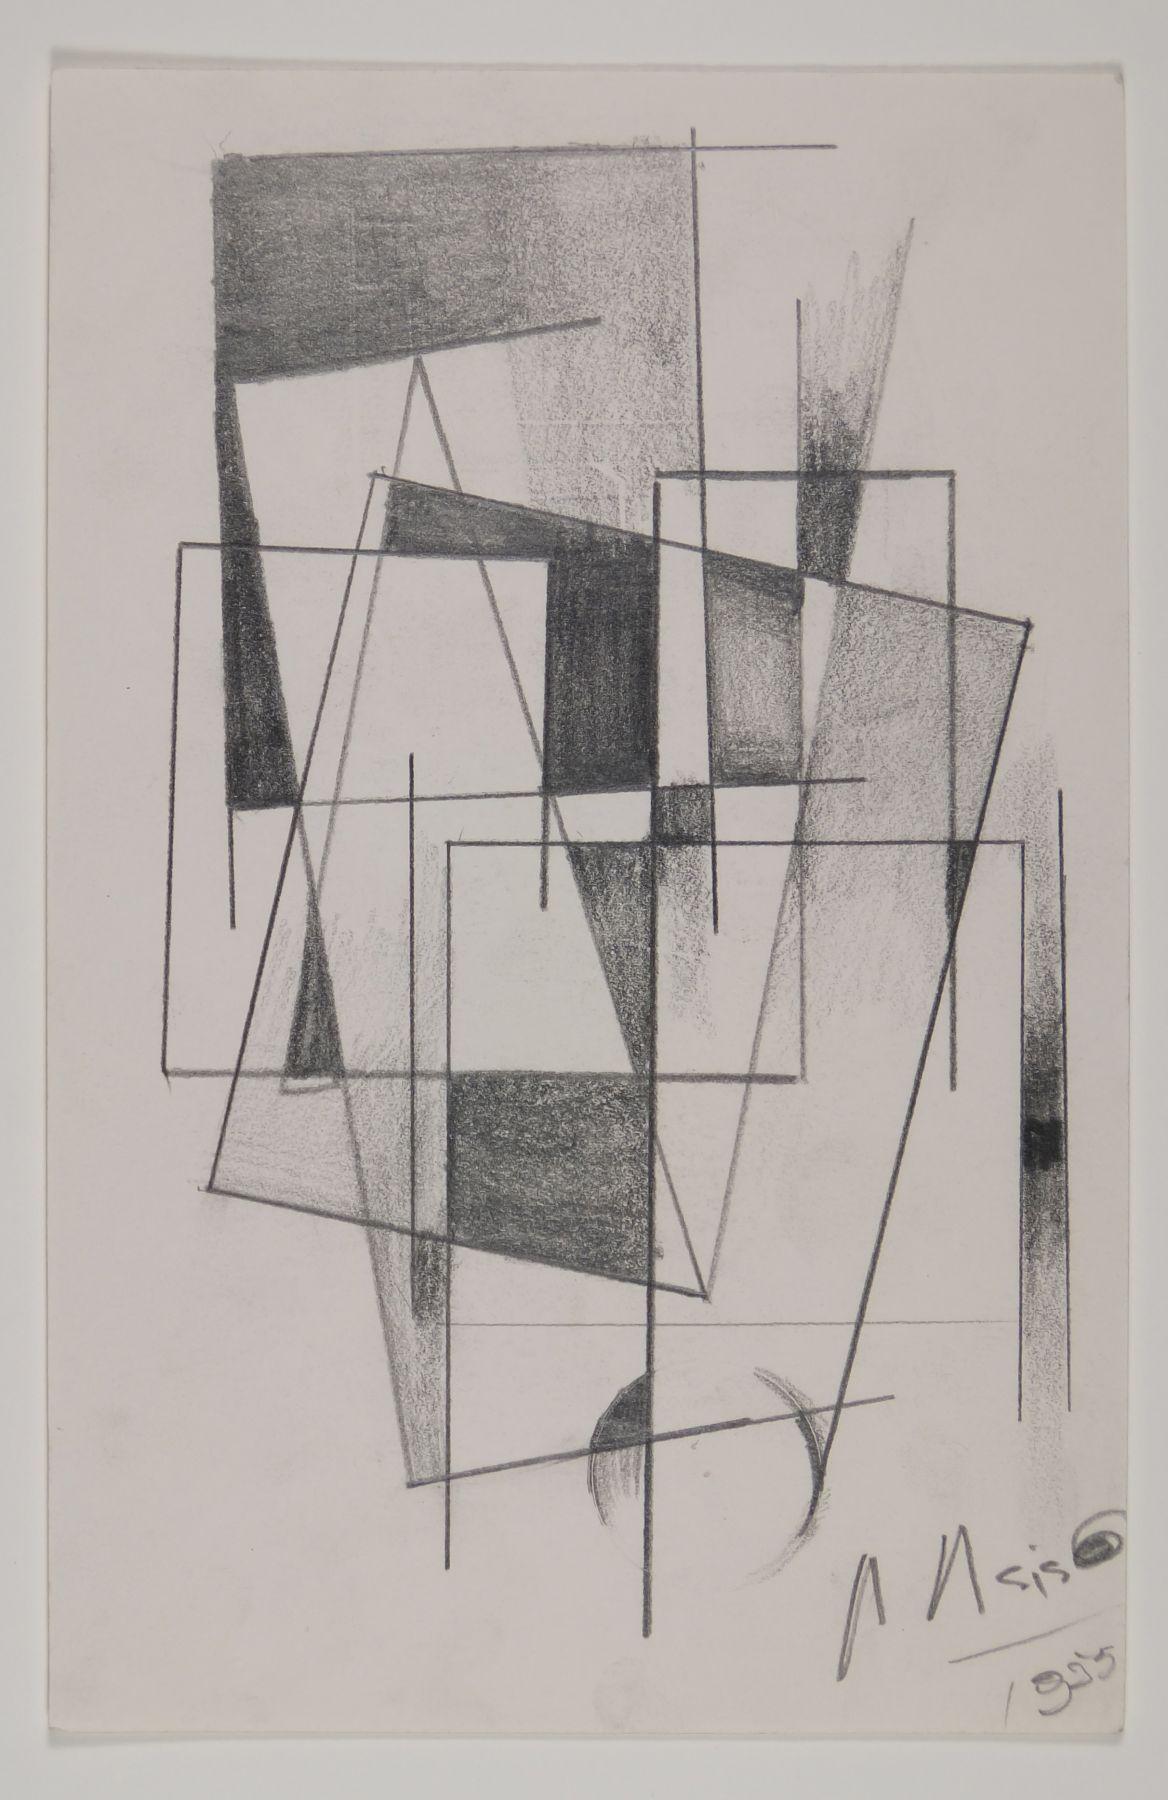 Antonio Asis, Untitled, 1955,Graphite on paper,8 1/4 x 5 5/16 in. (21 x 13.5 cm.)